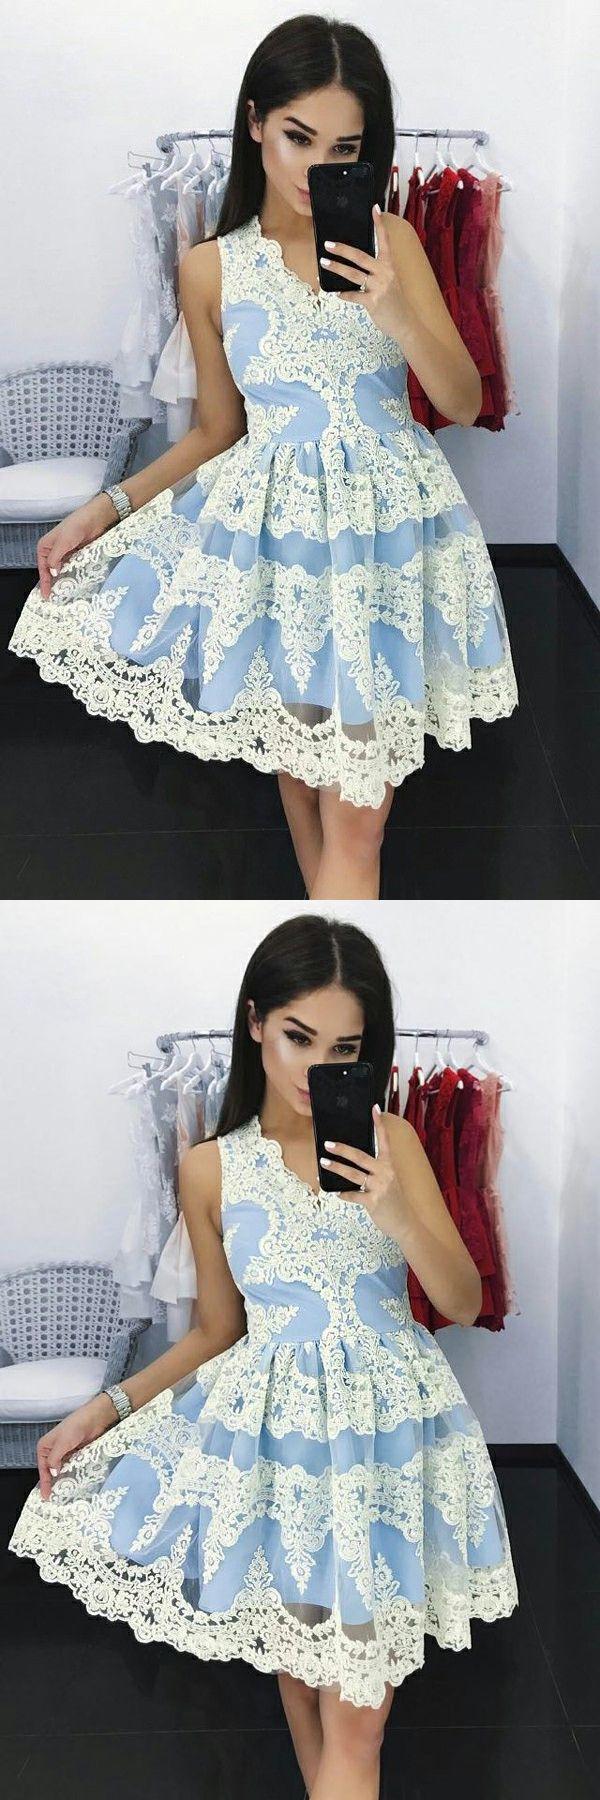 best womenus fashion images on pinterest ballroom dress prom